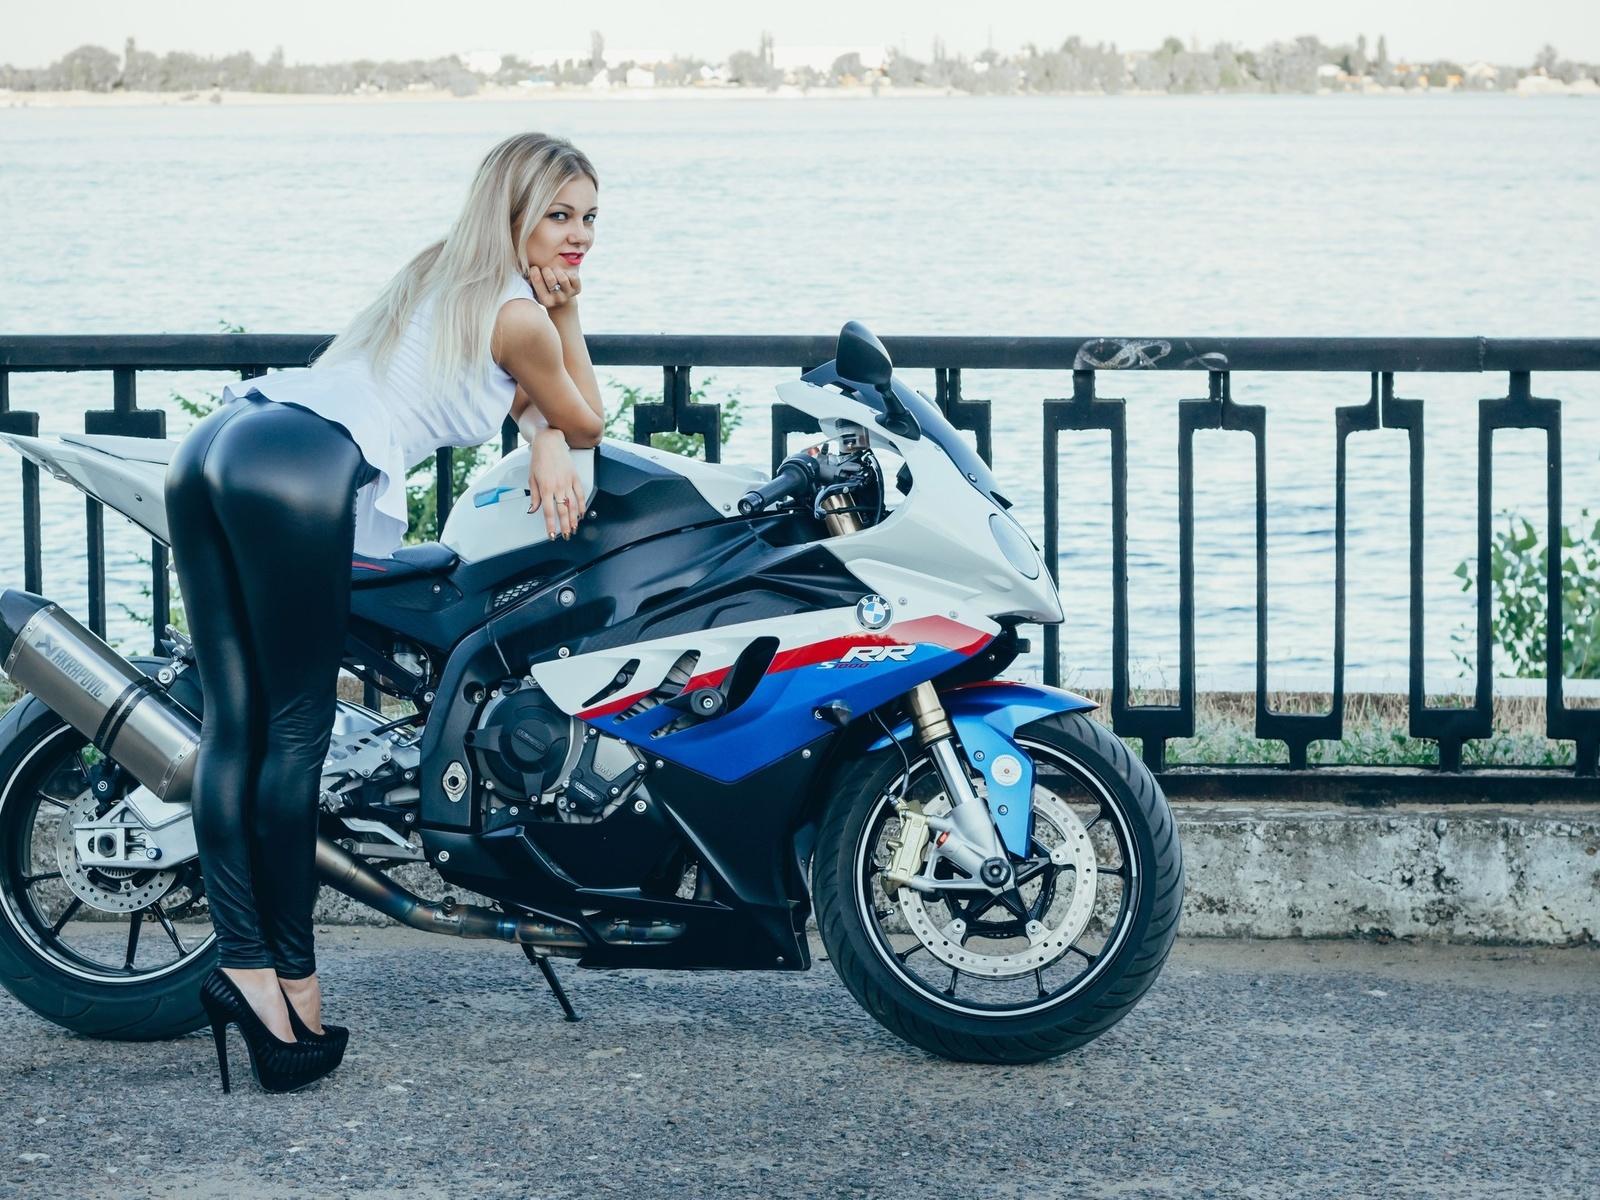 мотоцикл, девушка, байк, bmw, набережная